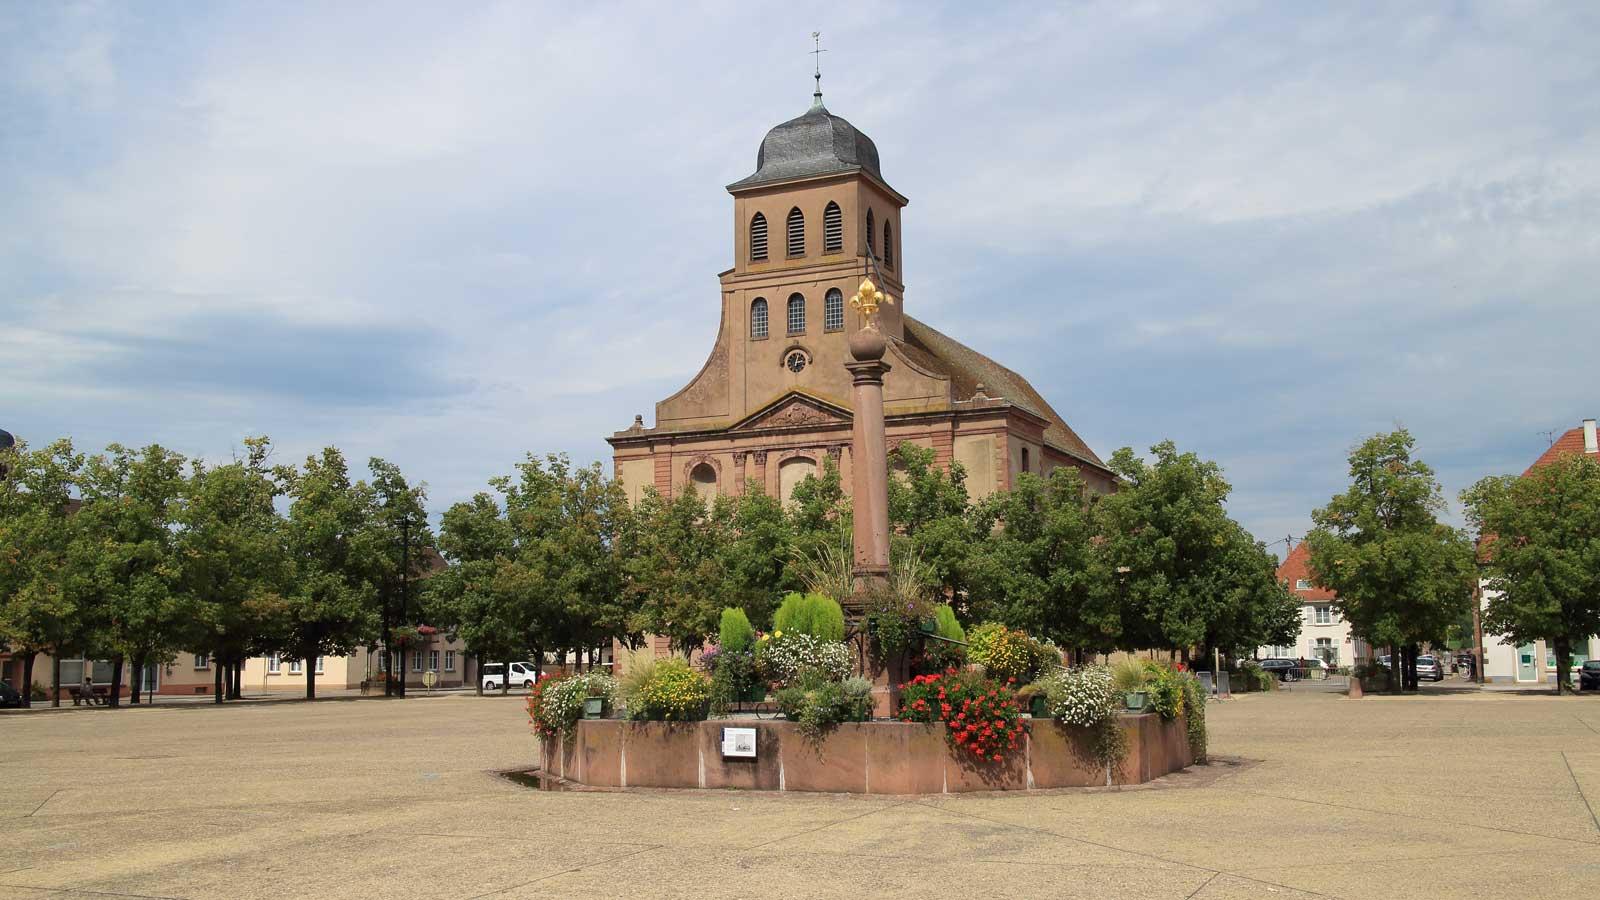 Rhine-10-08-14_17-00-30